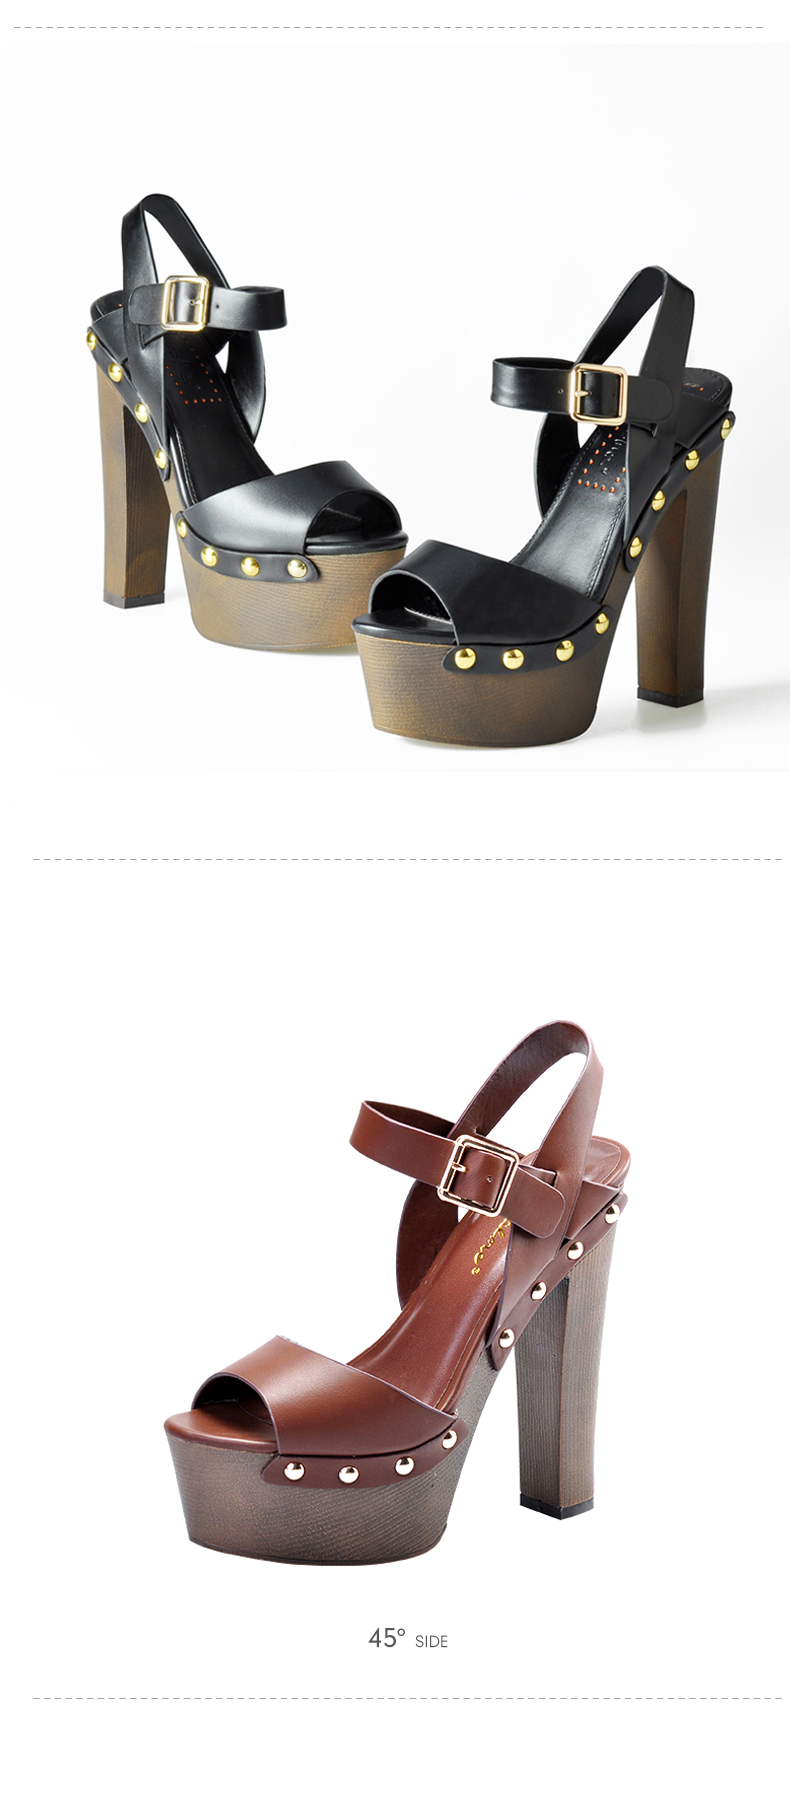 toe rivet heels wedges 3